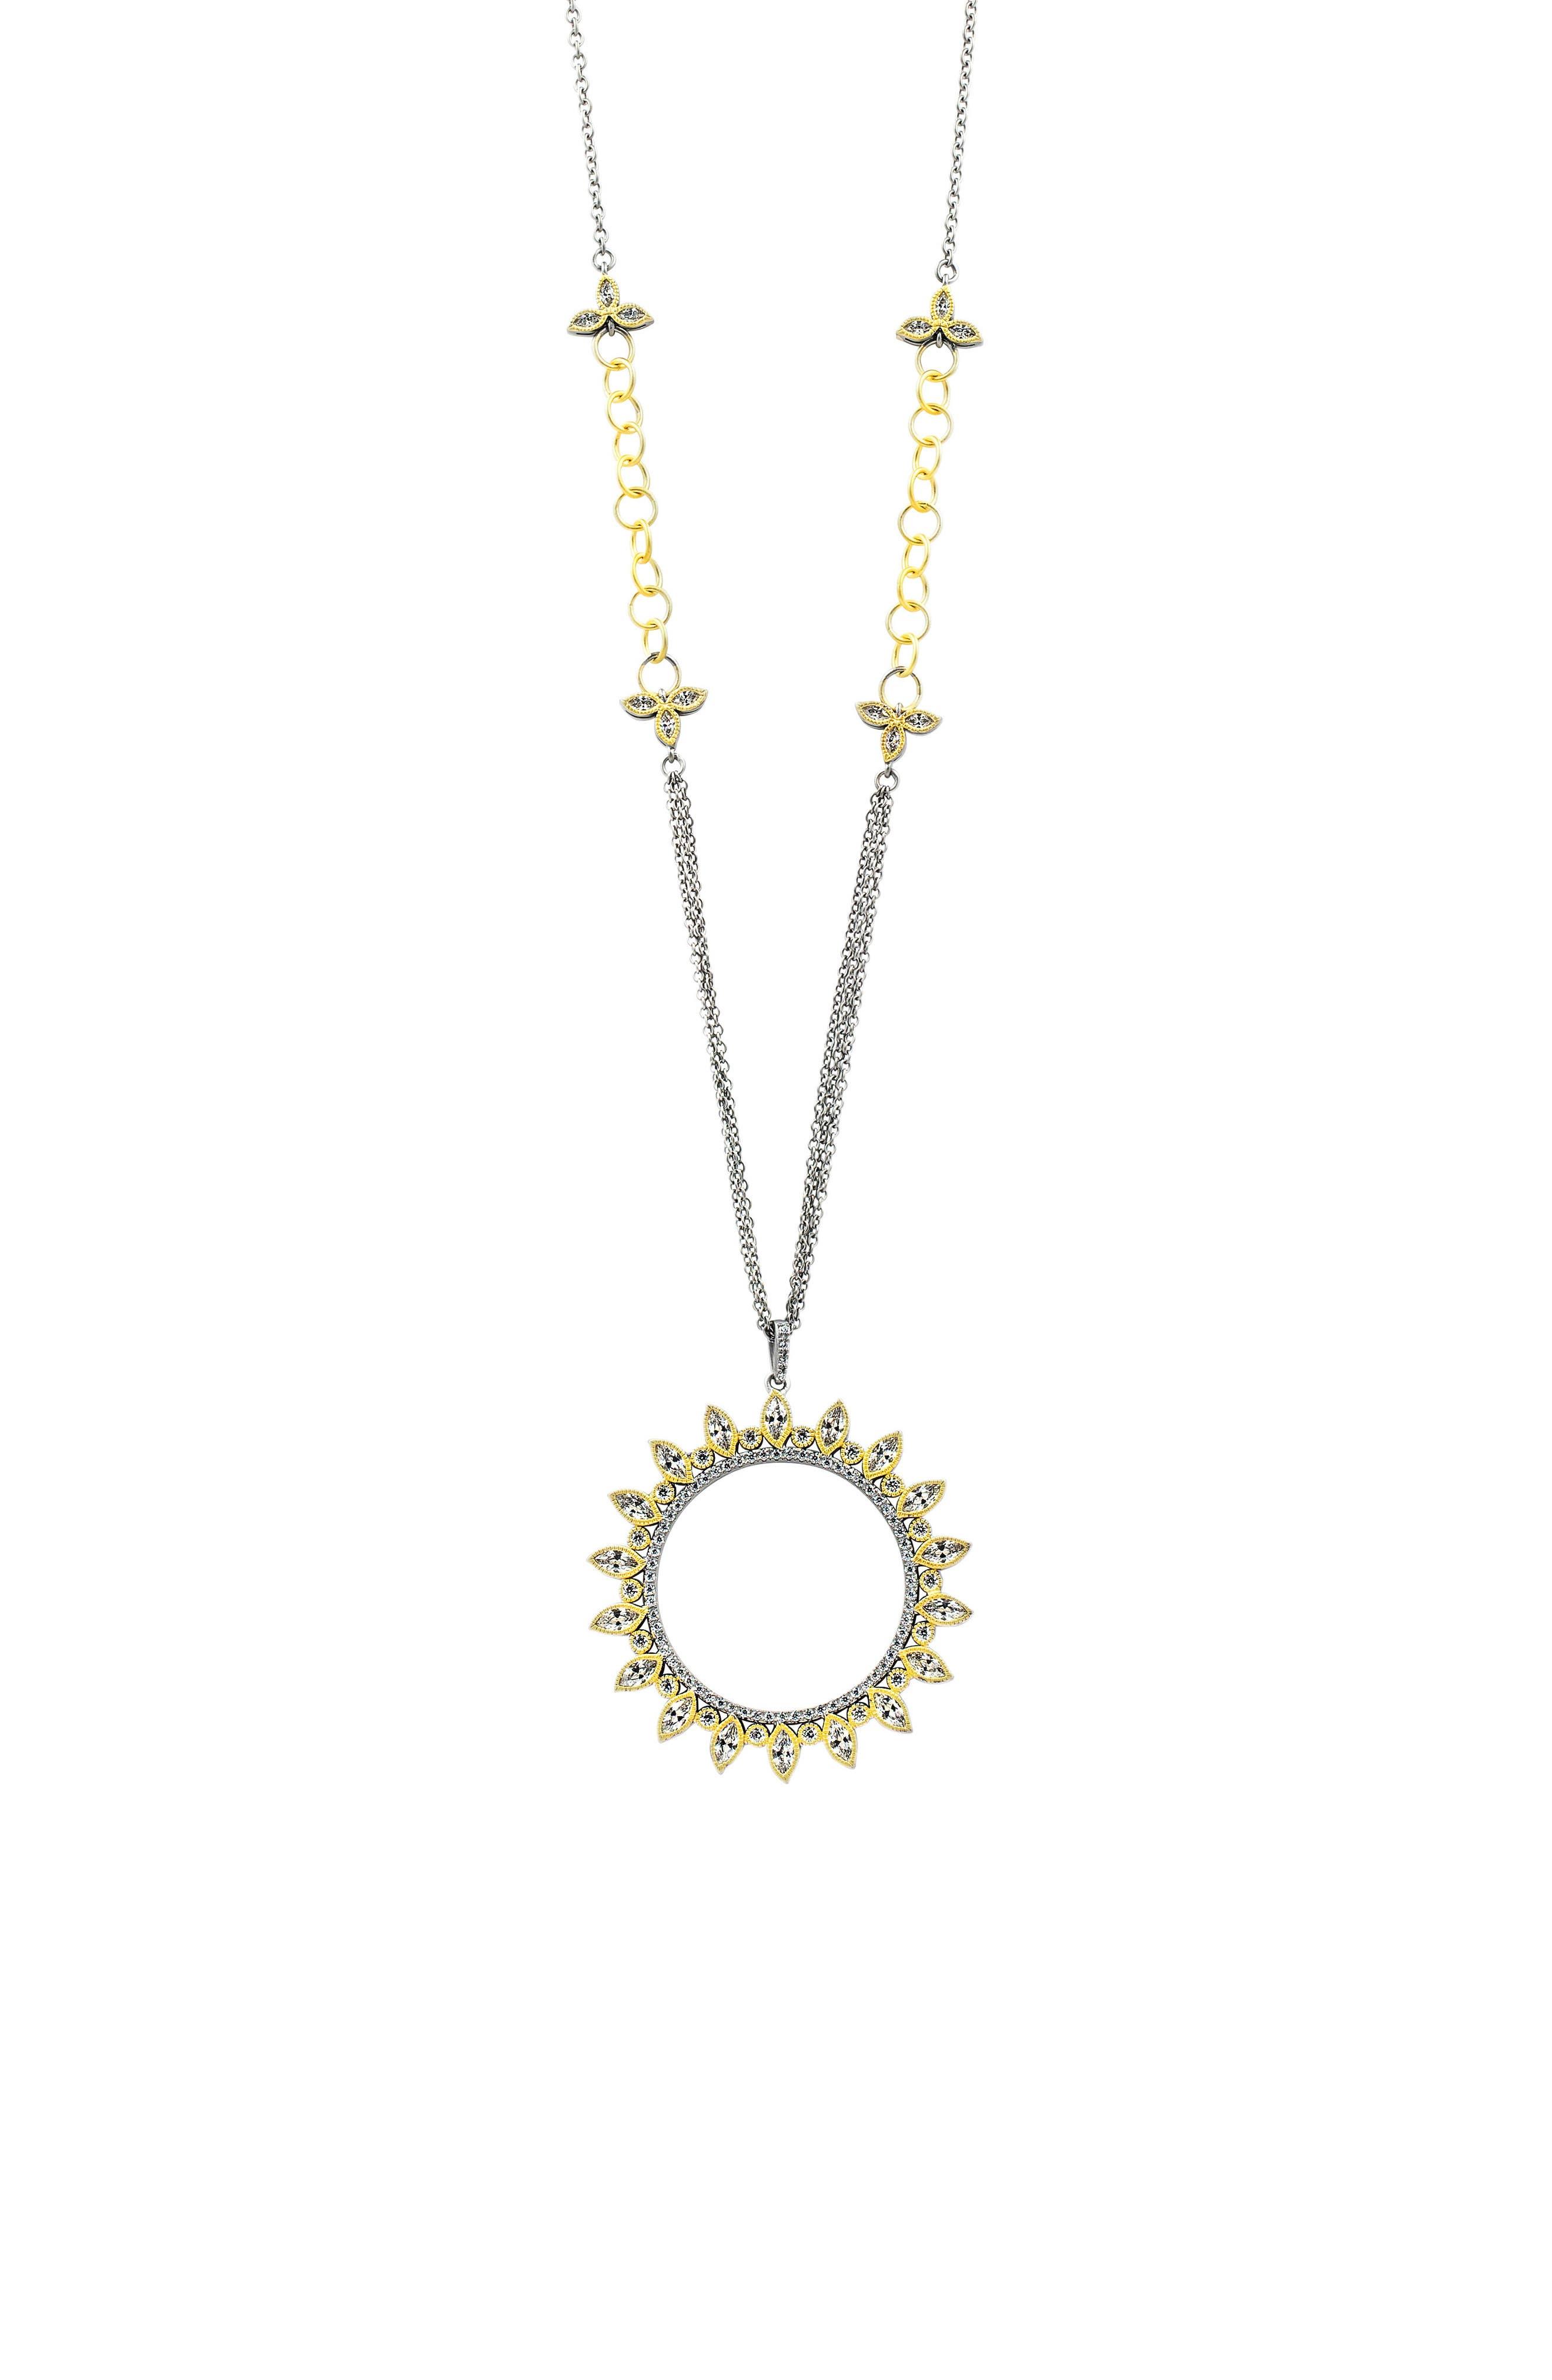 Alternate Image 1 Selected - FREIDA ROTHMAN Fleur Bloom Openwork Pendant Necklace